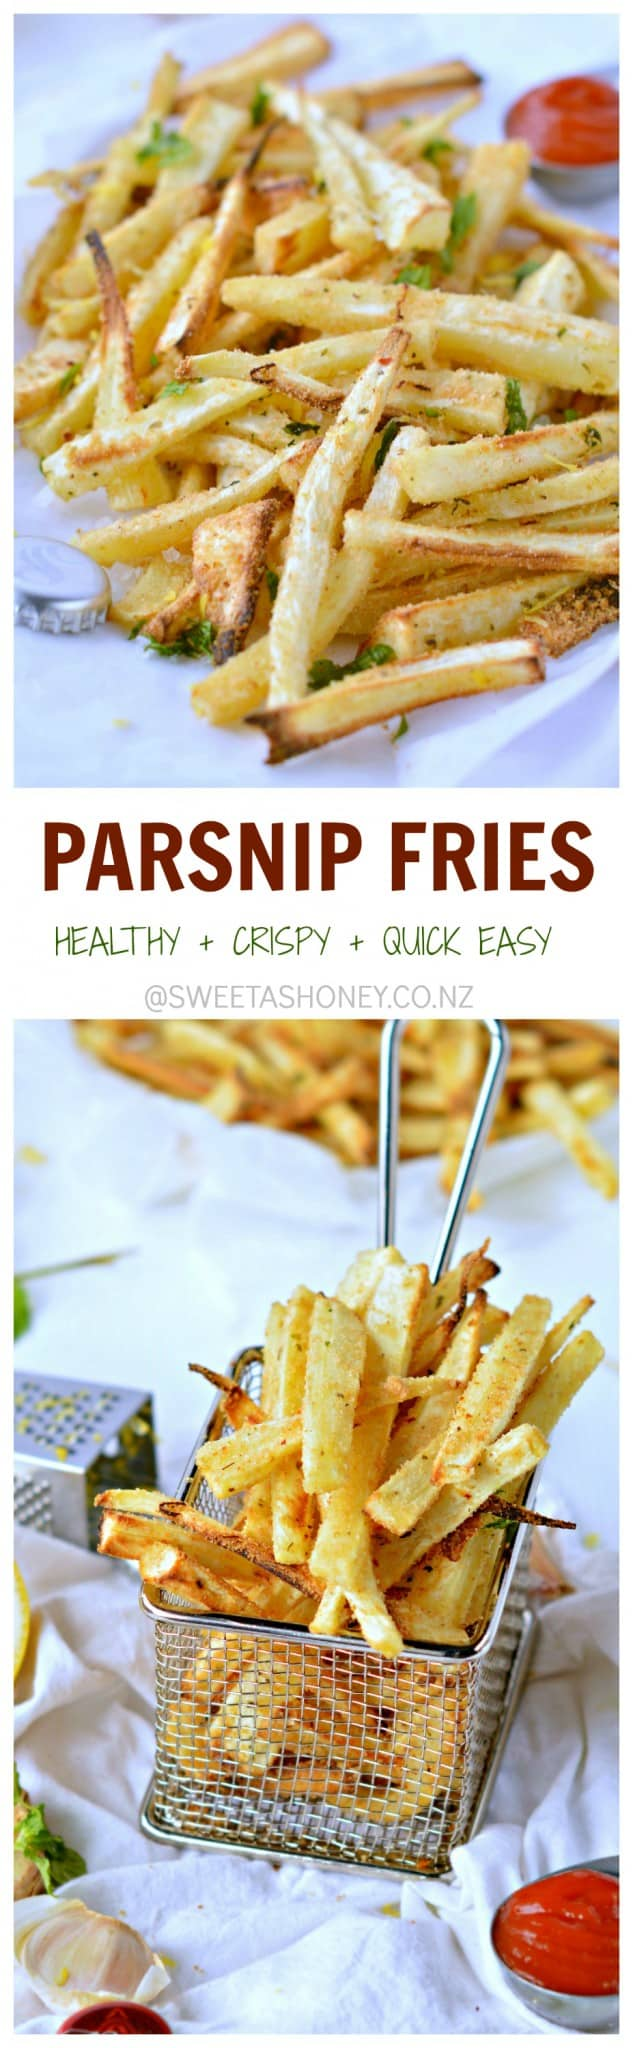 baked parsnip fries